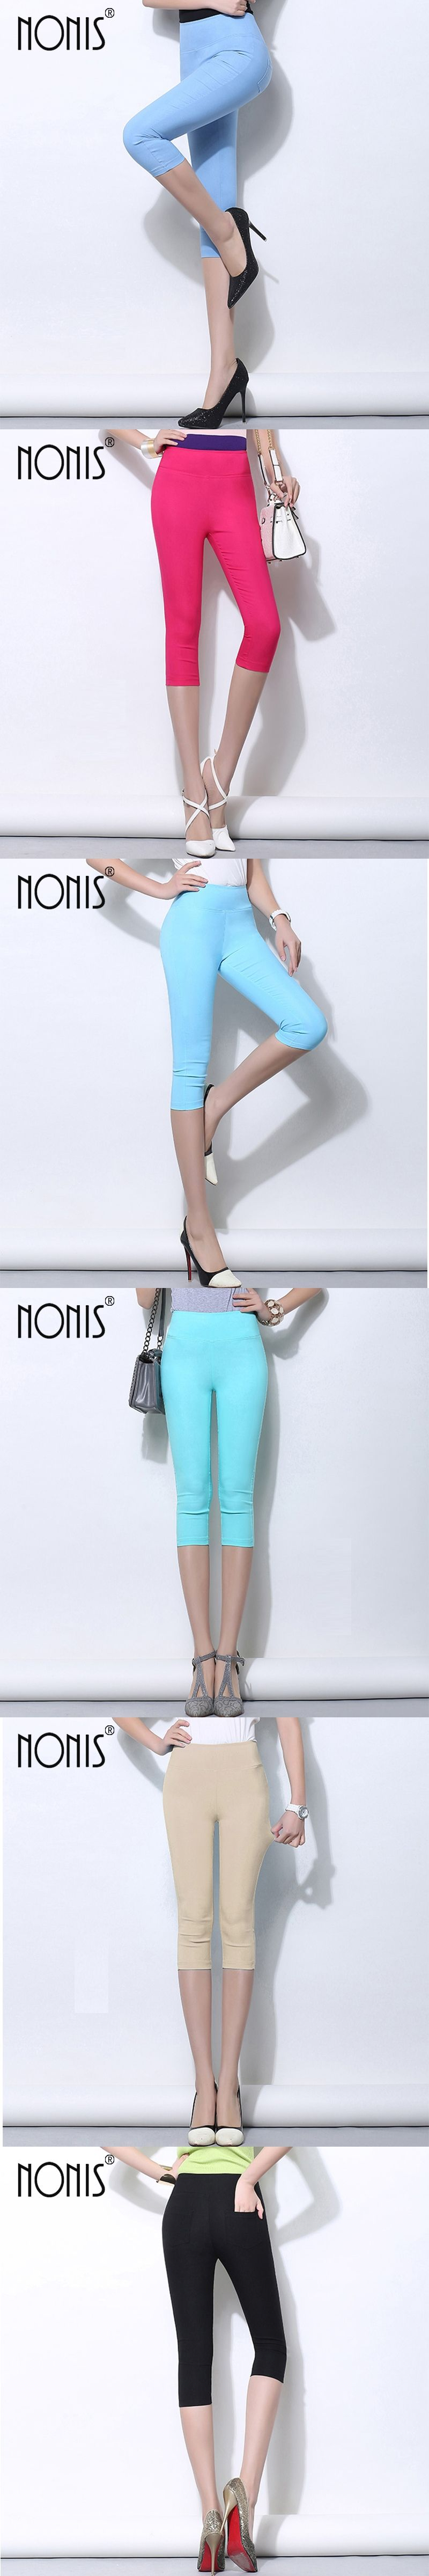 5a5986c33a0 Nonis Candy Color Women Leggings Candy Color High Stretch Pencil Pants  Elastic Skinny Capri Legging Female